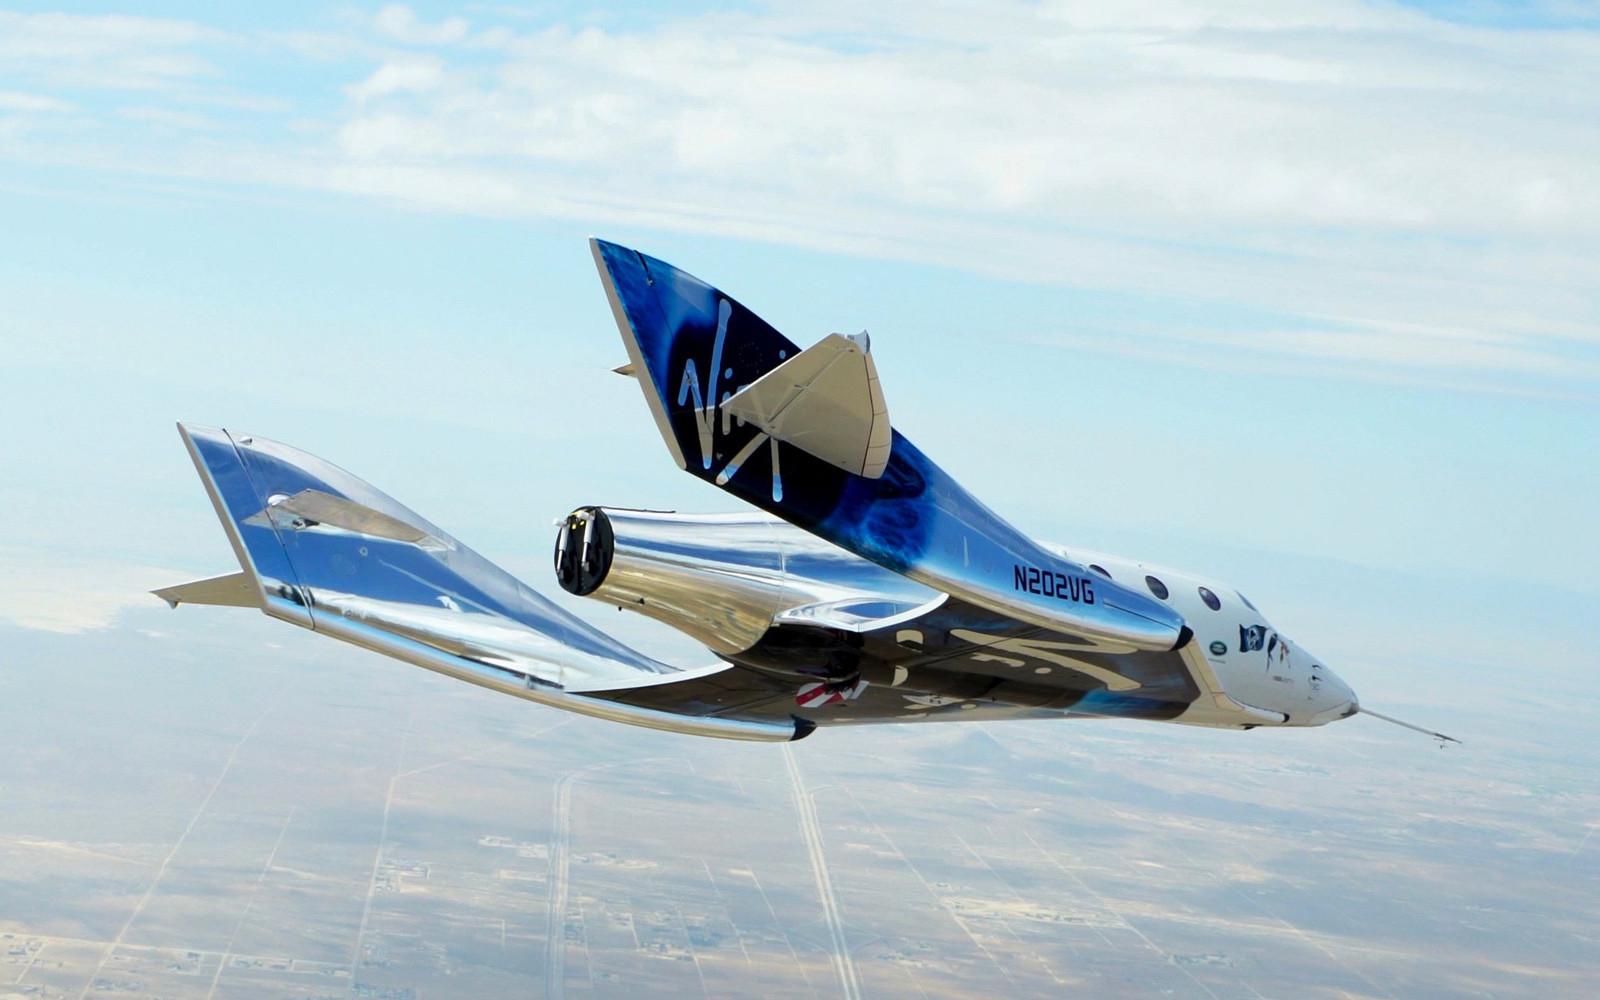 spaceshiptwo-test-flight.jpg